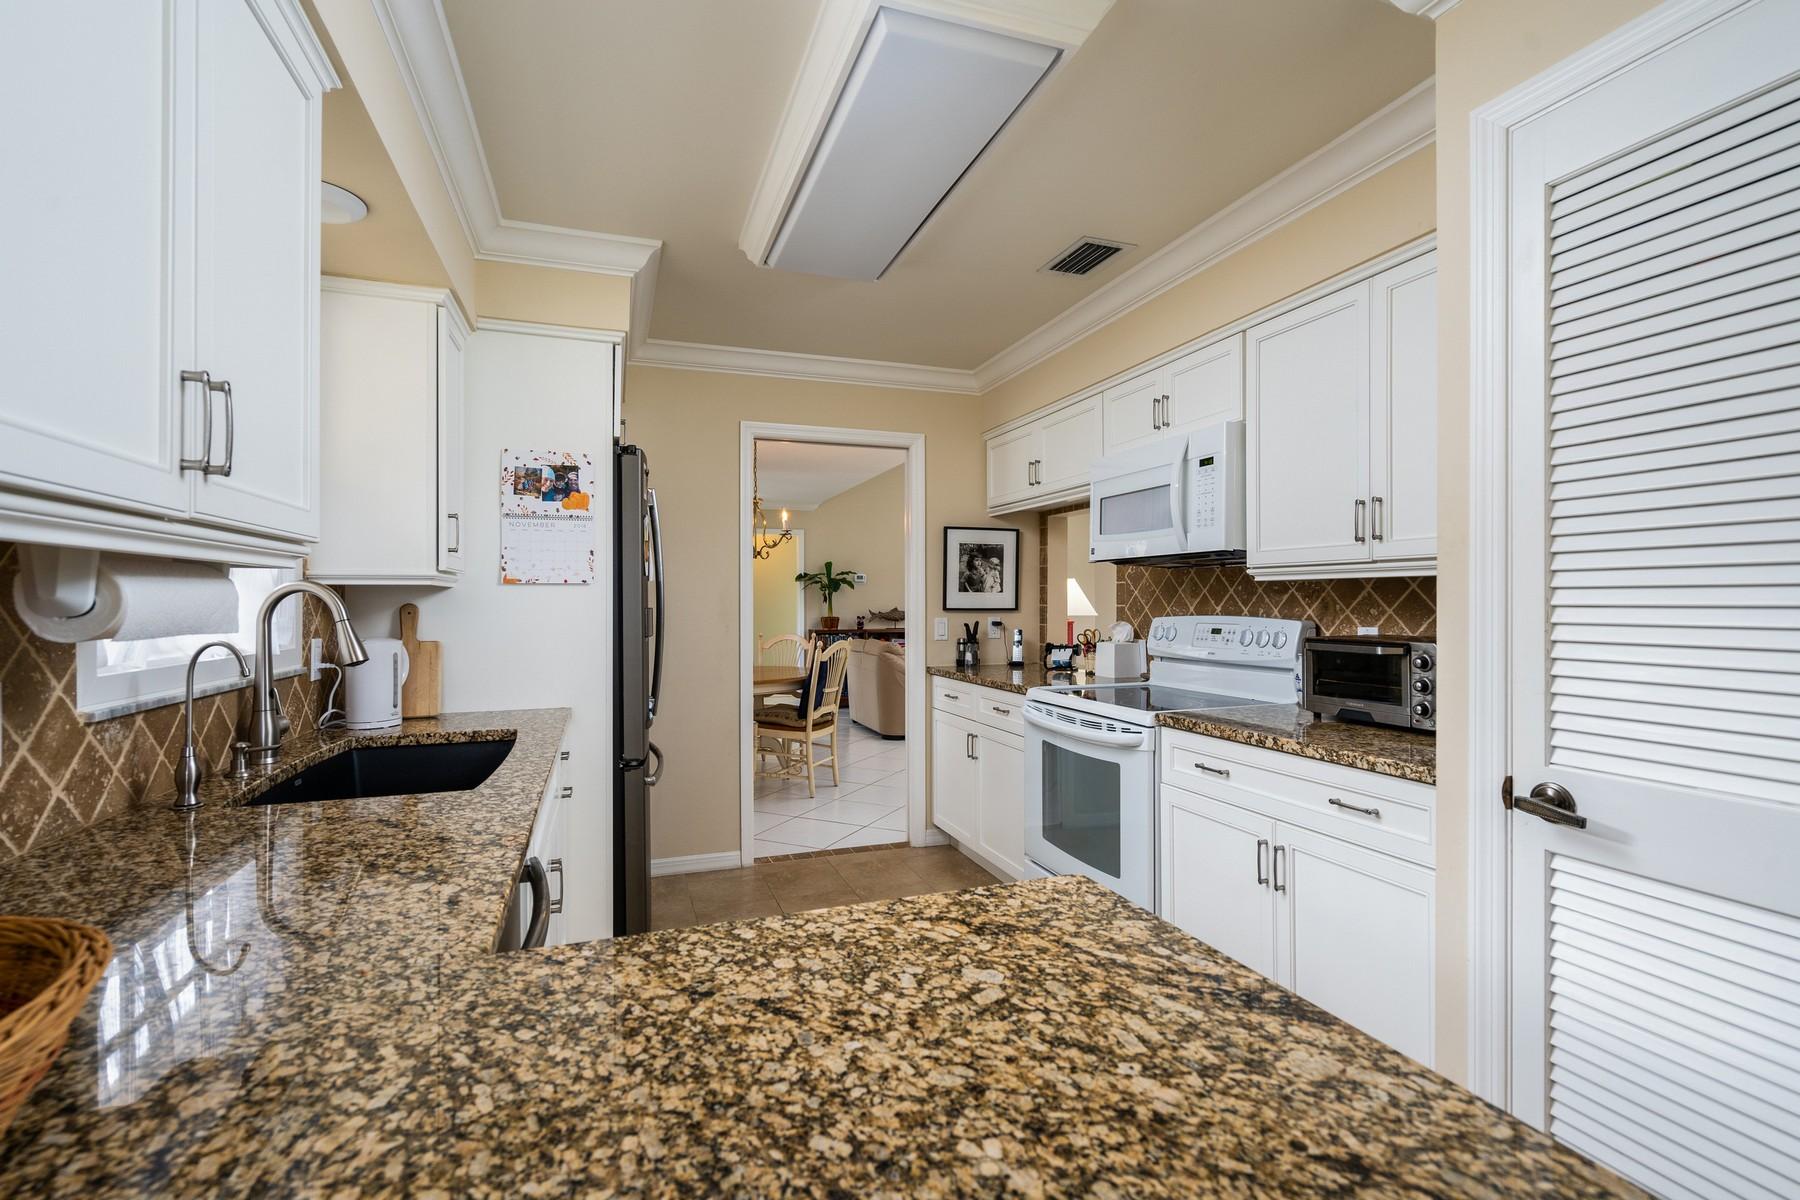 Additional photo for property listing at Superb Golf Villa With Panoramic Golf and Lake Views 120 Prestwick Circle Vero Beach, Florida 32967 Förenta staterna